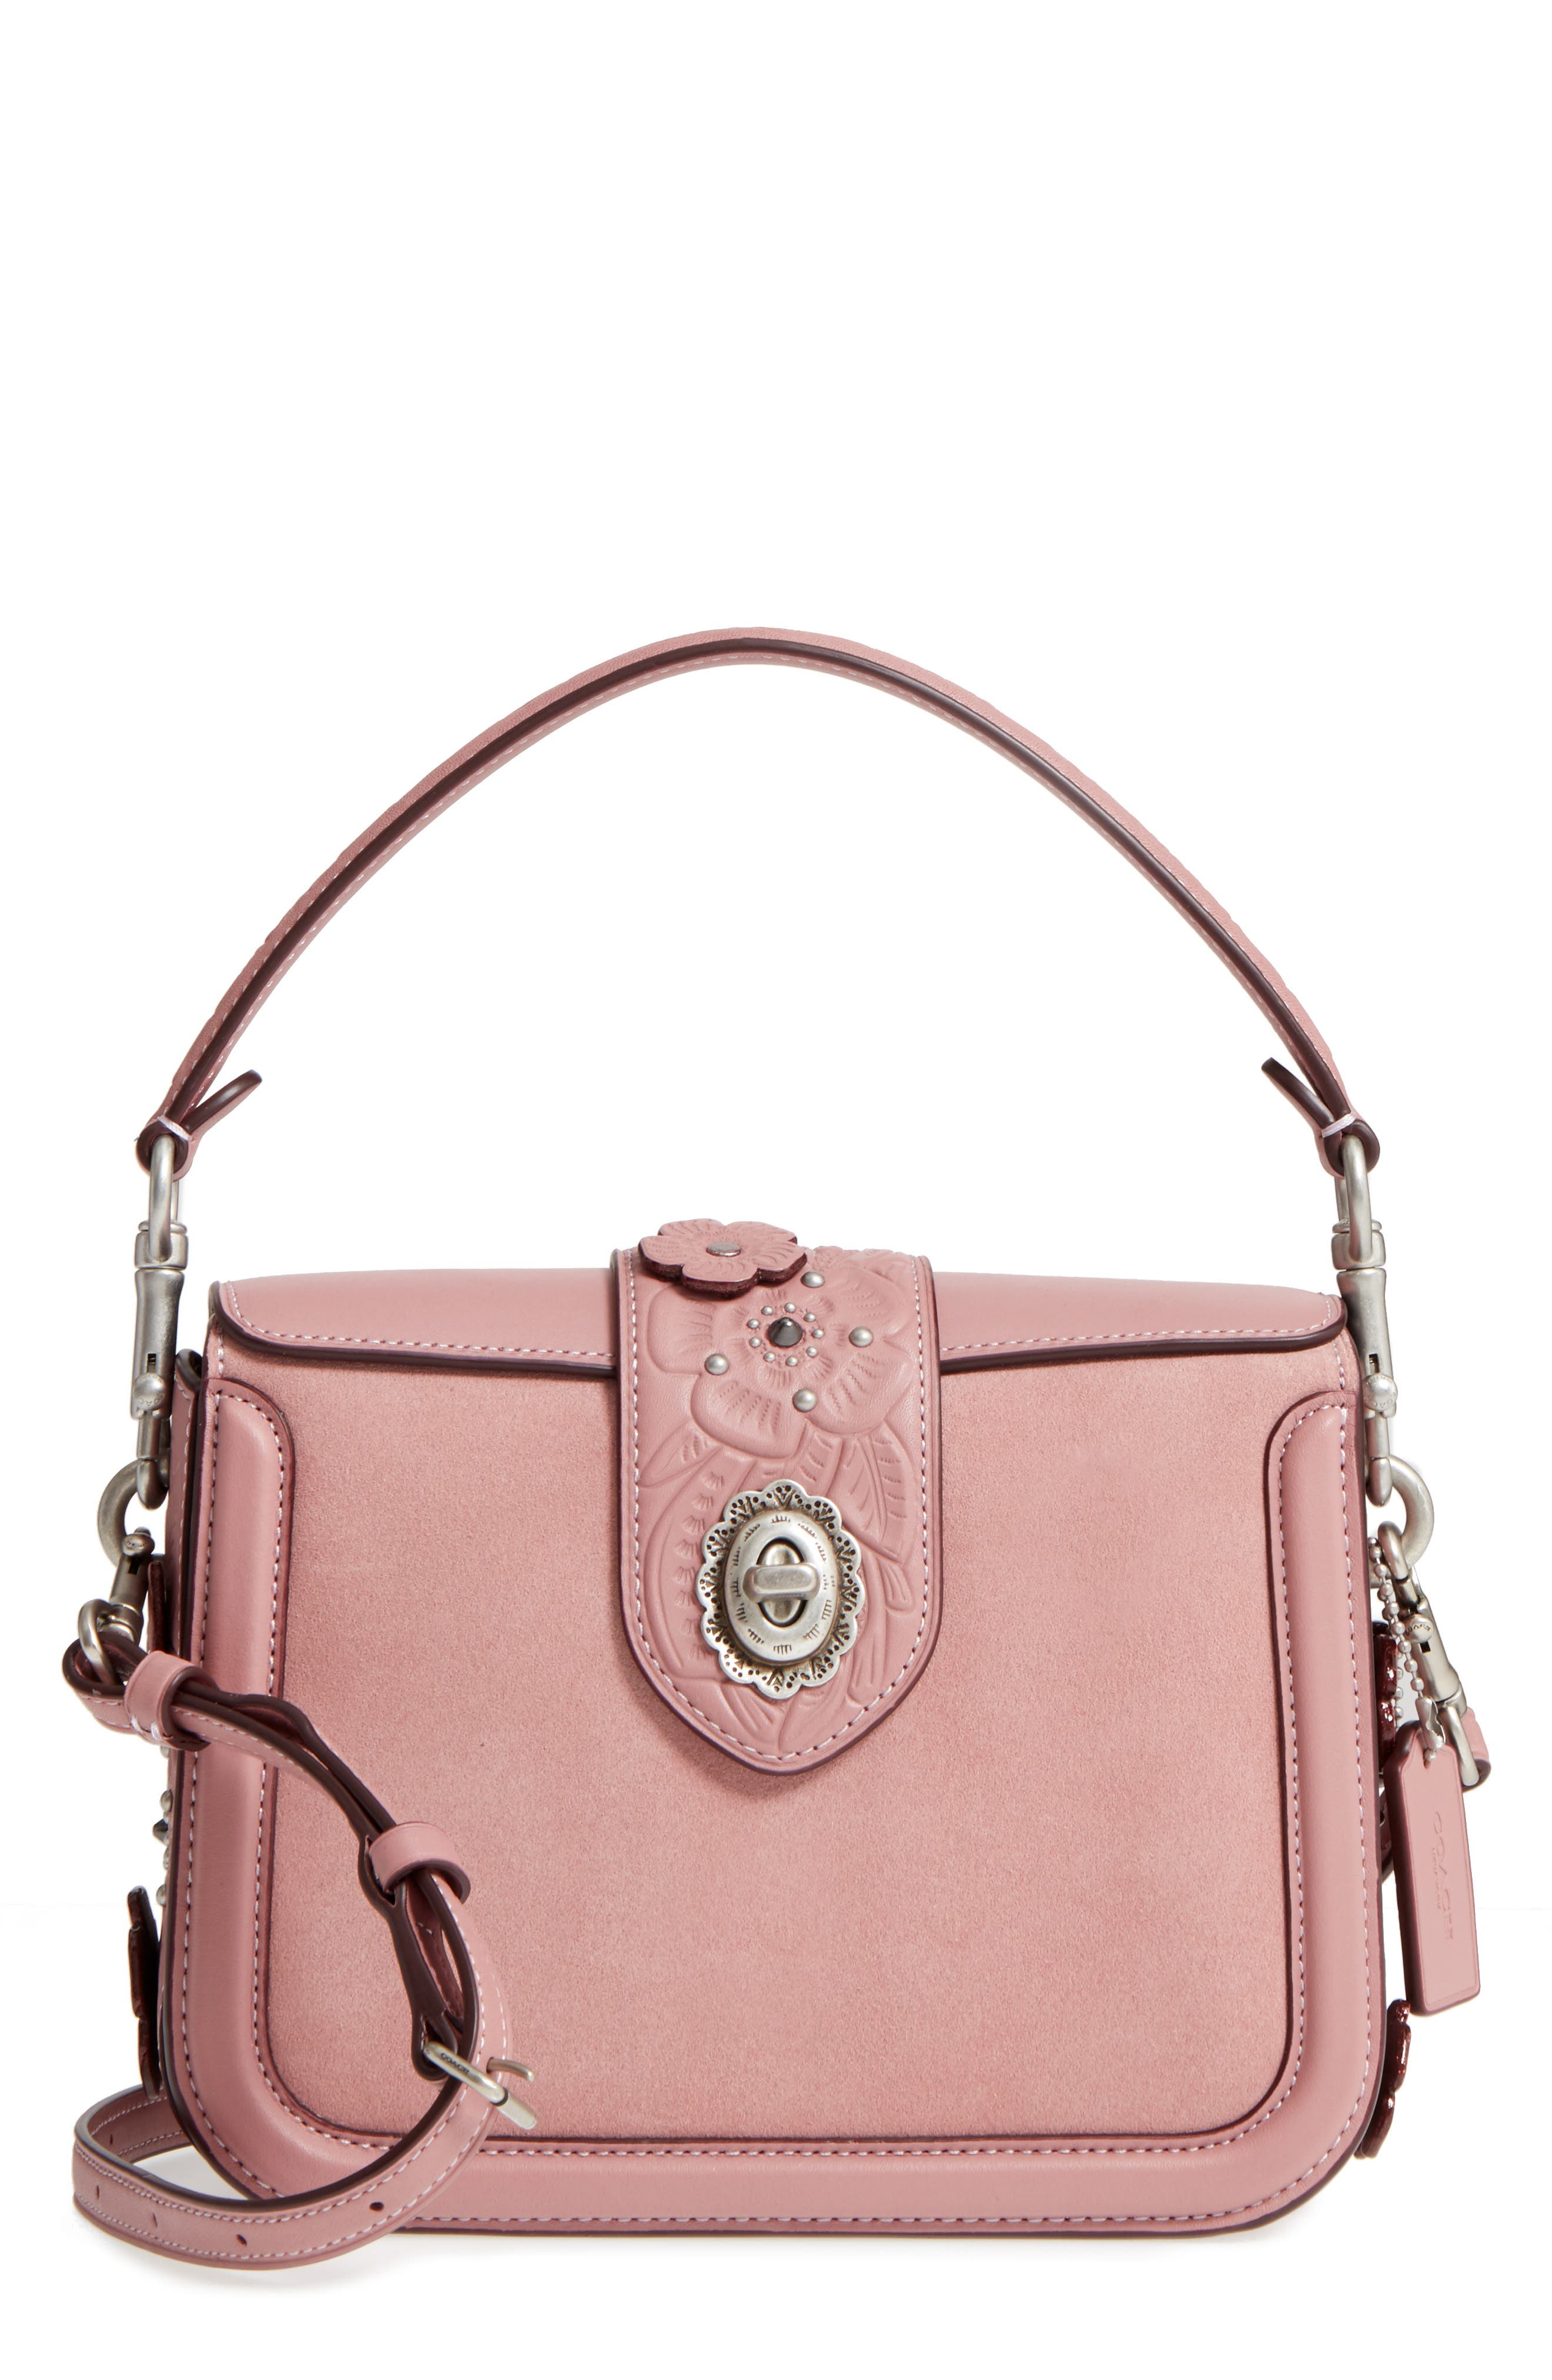 Page Tea Rose Calfskin Leather Top Handle Satchel,                         Main,                         color, 655